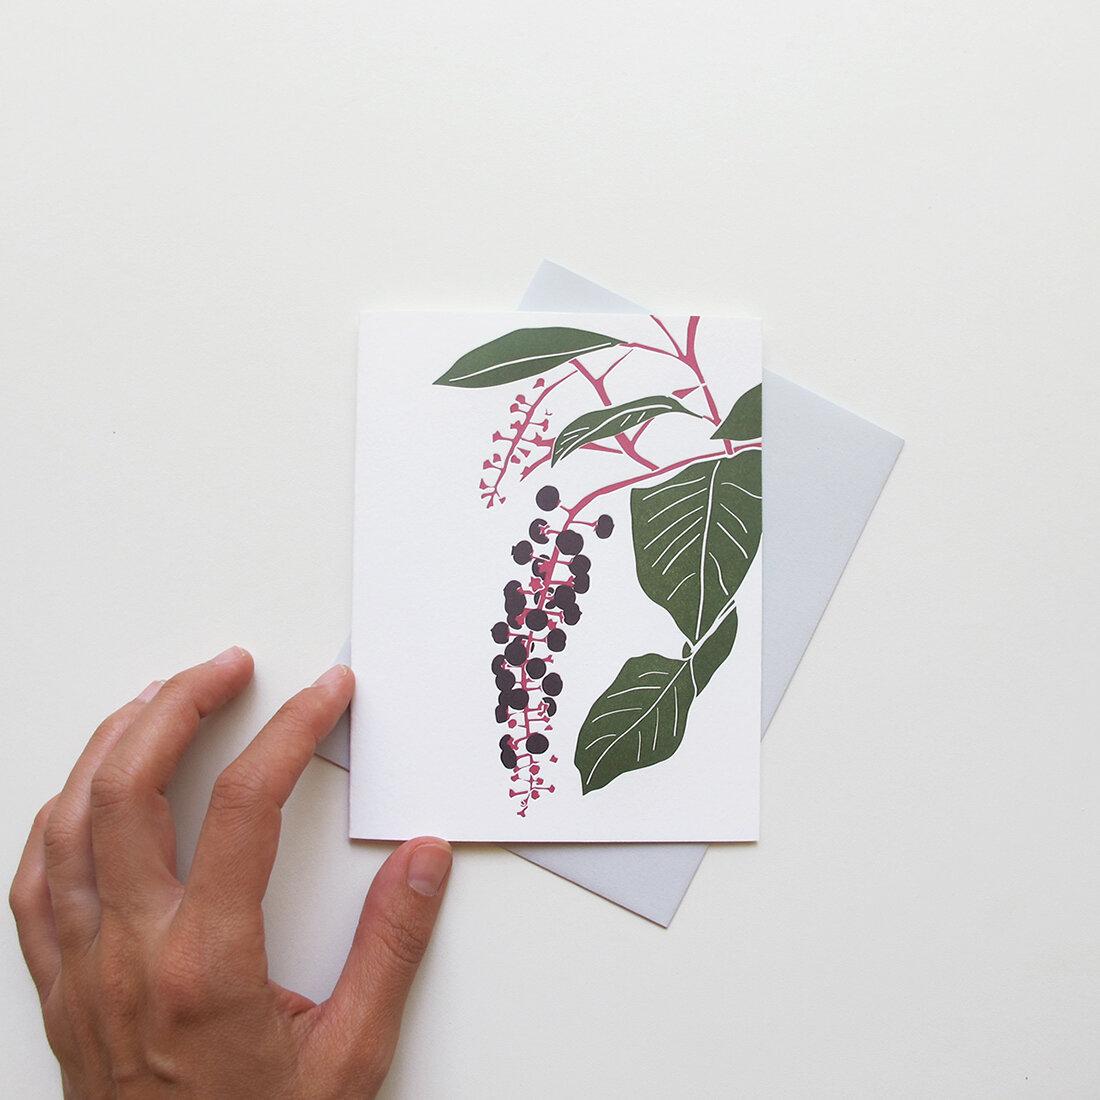 pokeberry_whitehand.jpg